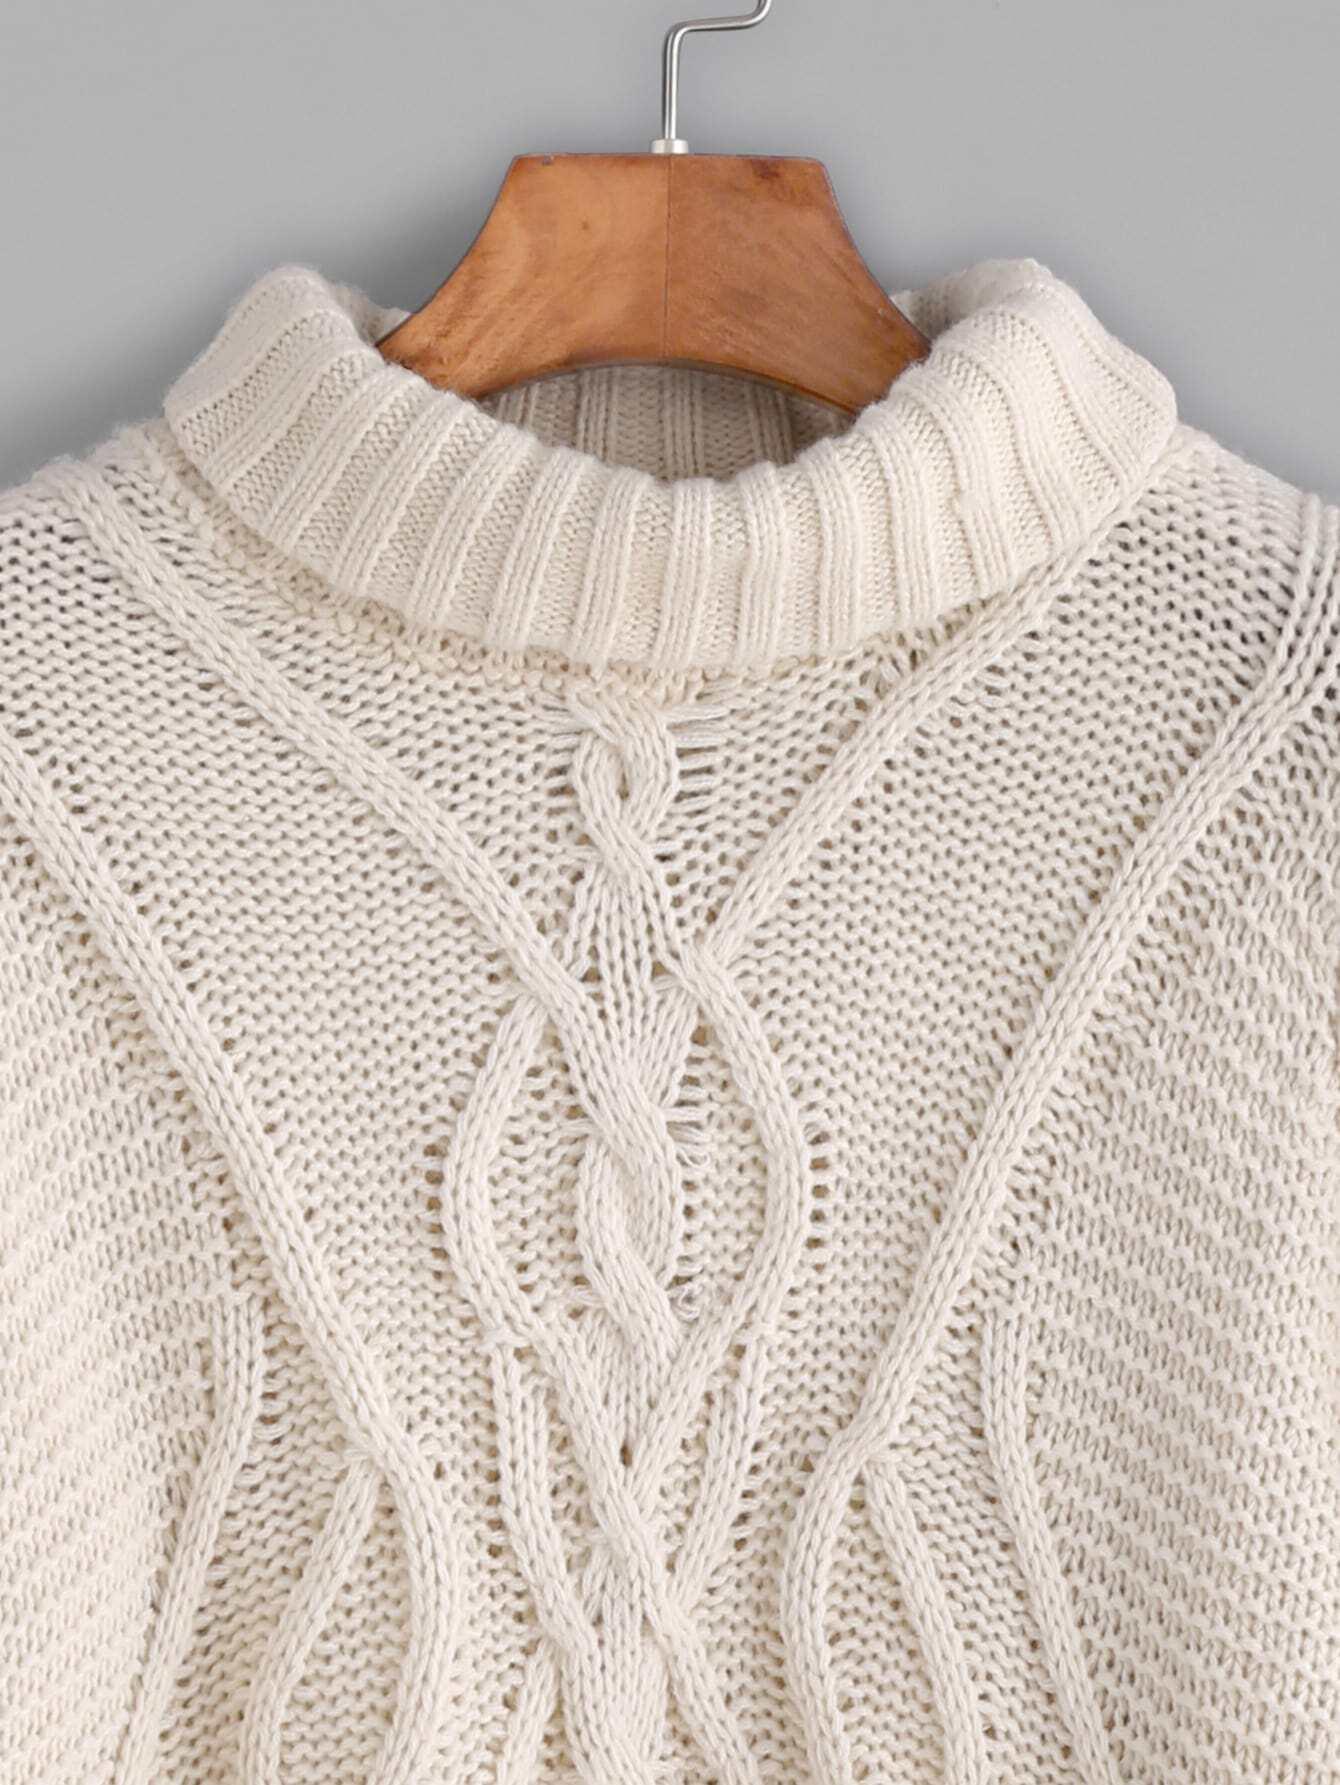 sweater161109001_2